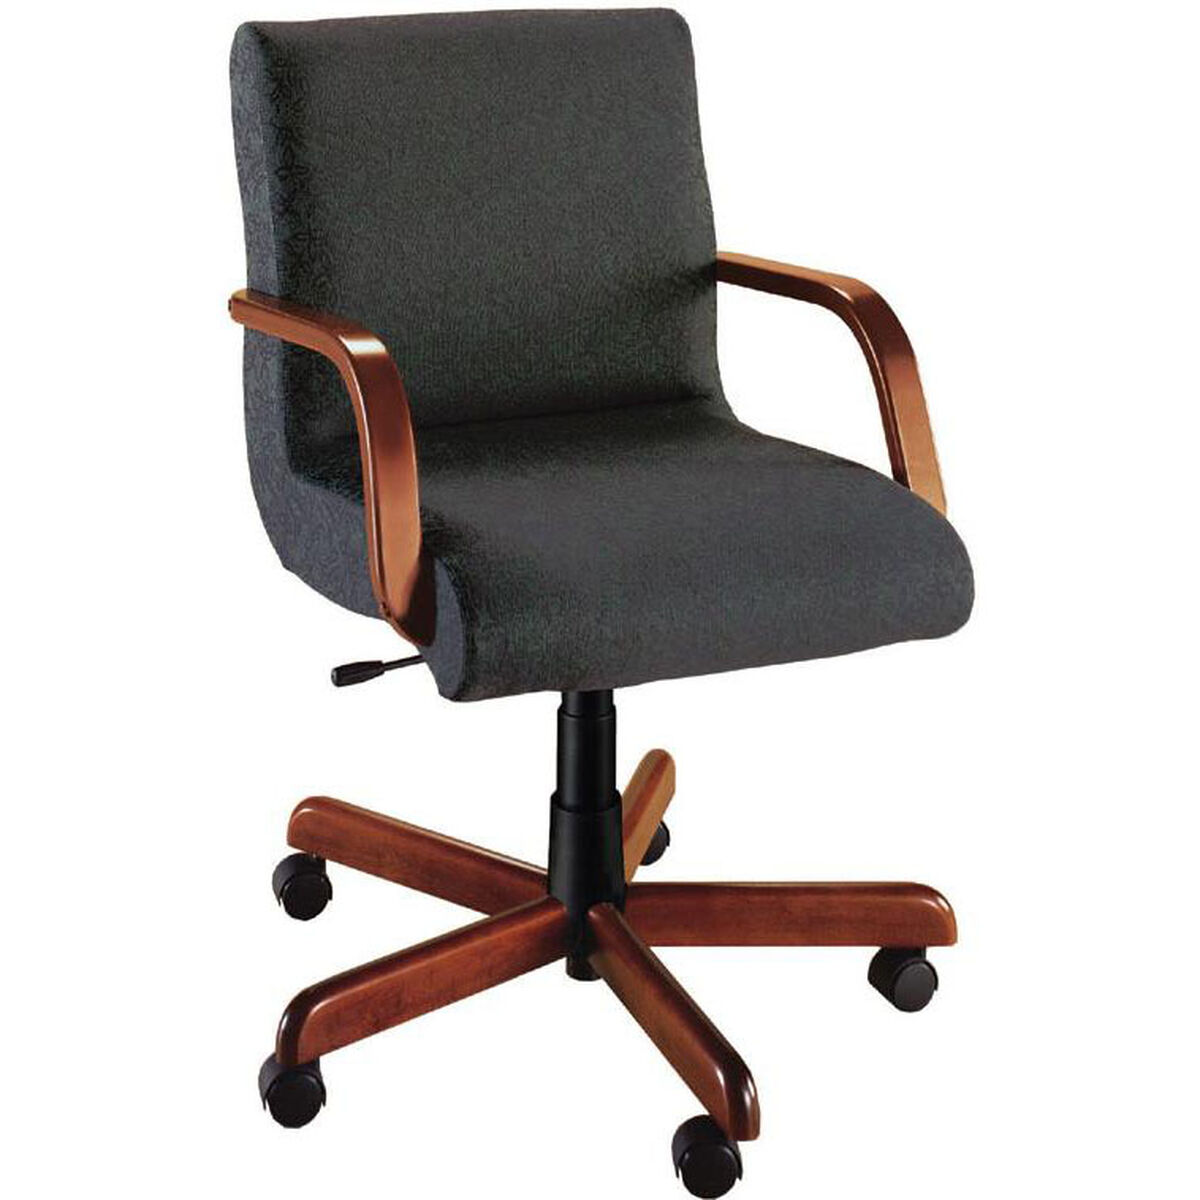 High Point Furniture Industries 1007 Hpf 1007